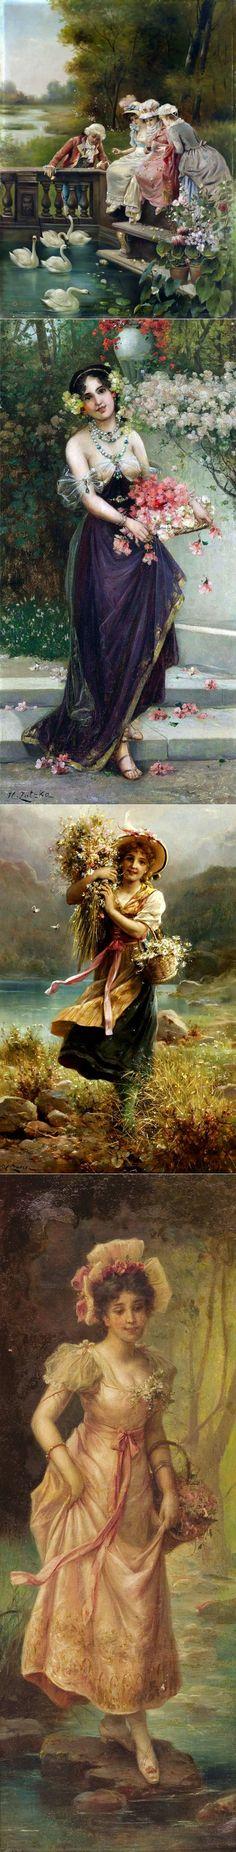 Hans Zatzka (Ханс Зацка, 1859-1945, Austrian) 1 | искусство | Постила